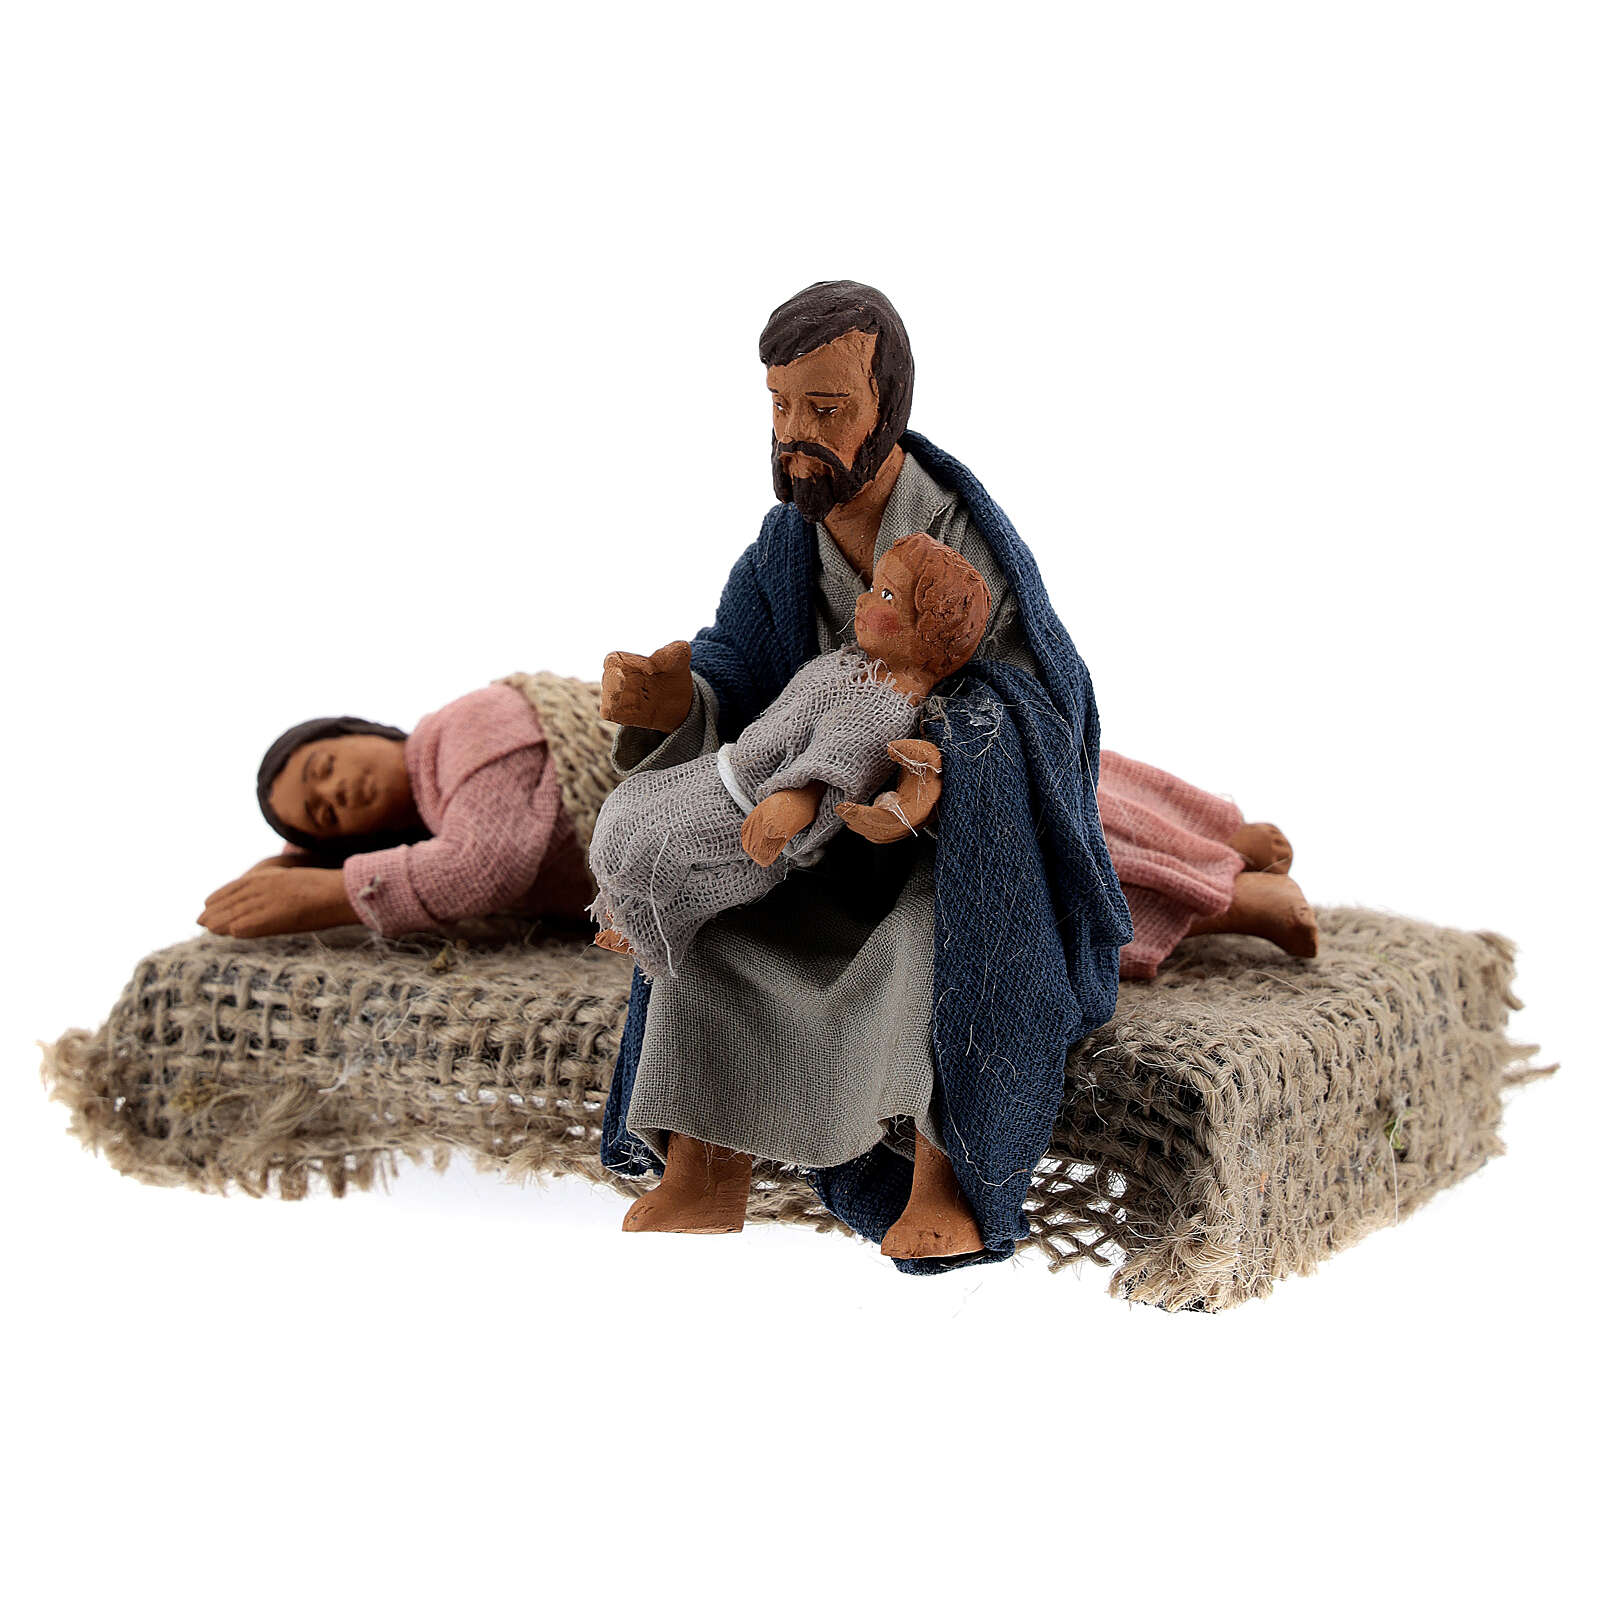 Holy Family sleeping Mary figurine, 10 cm Neapolitan nativity 4